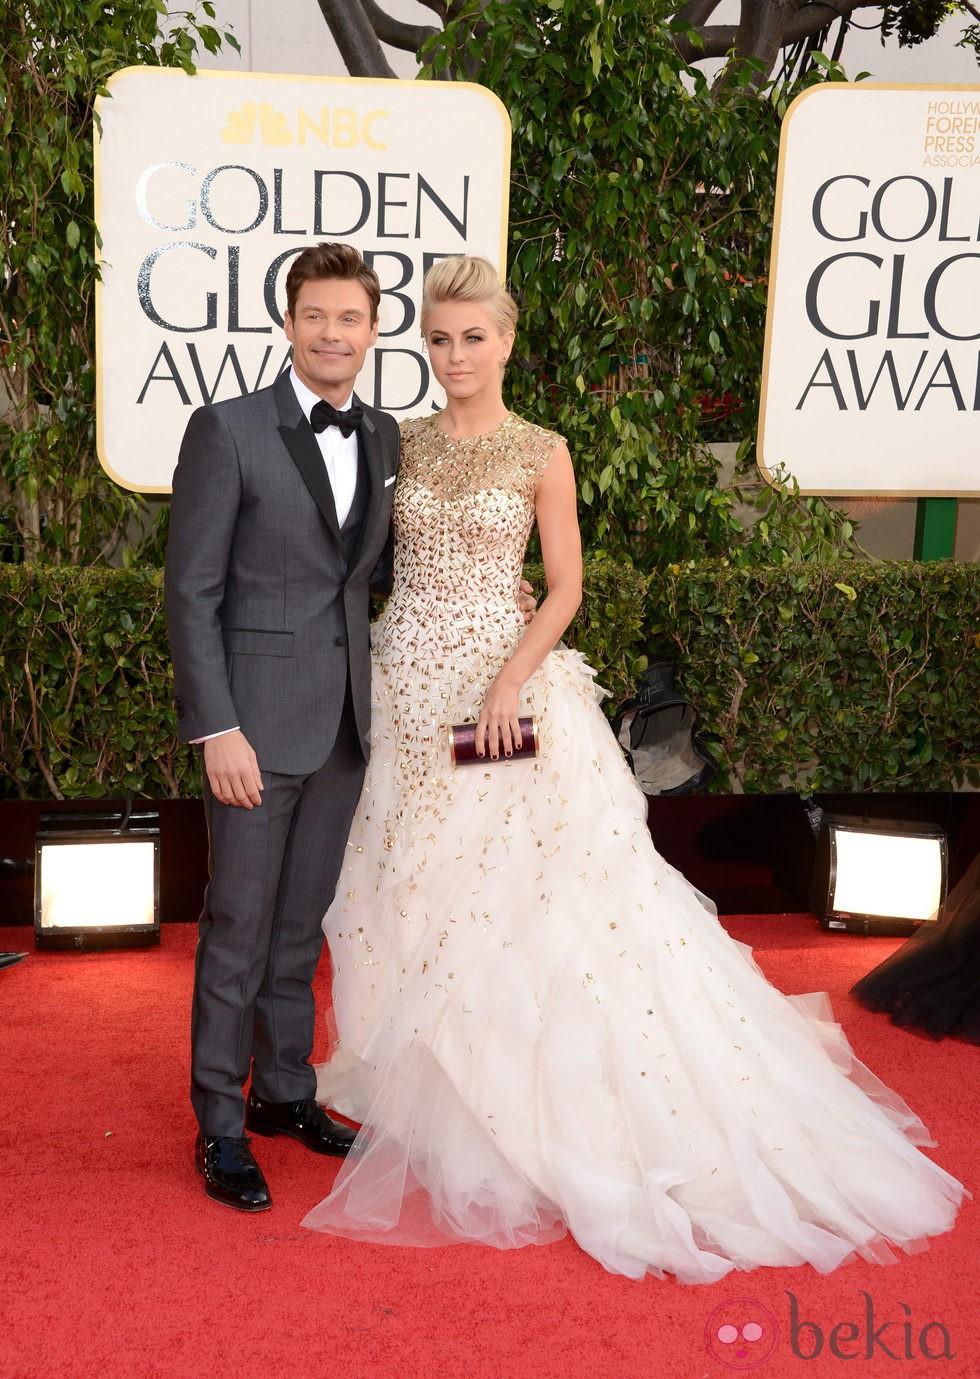 Ryan Seacrest y Julianne Hough en los Globos de Oro 2013